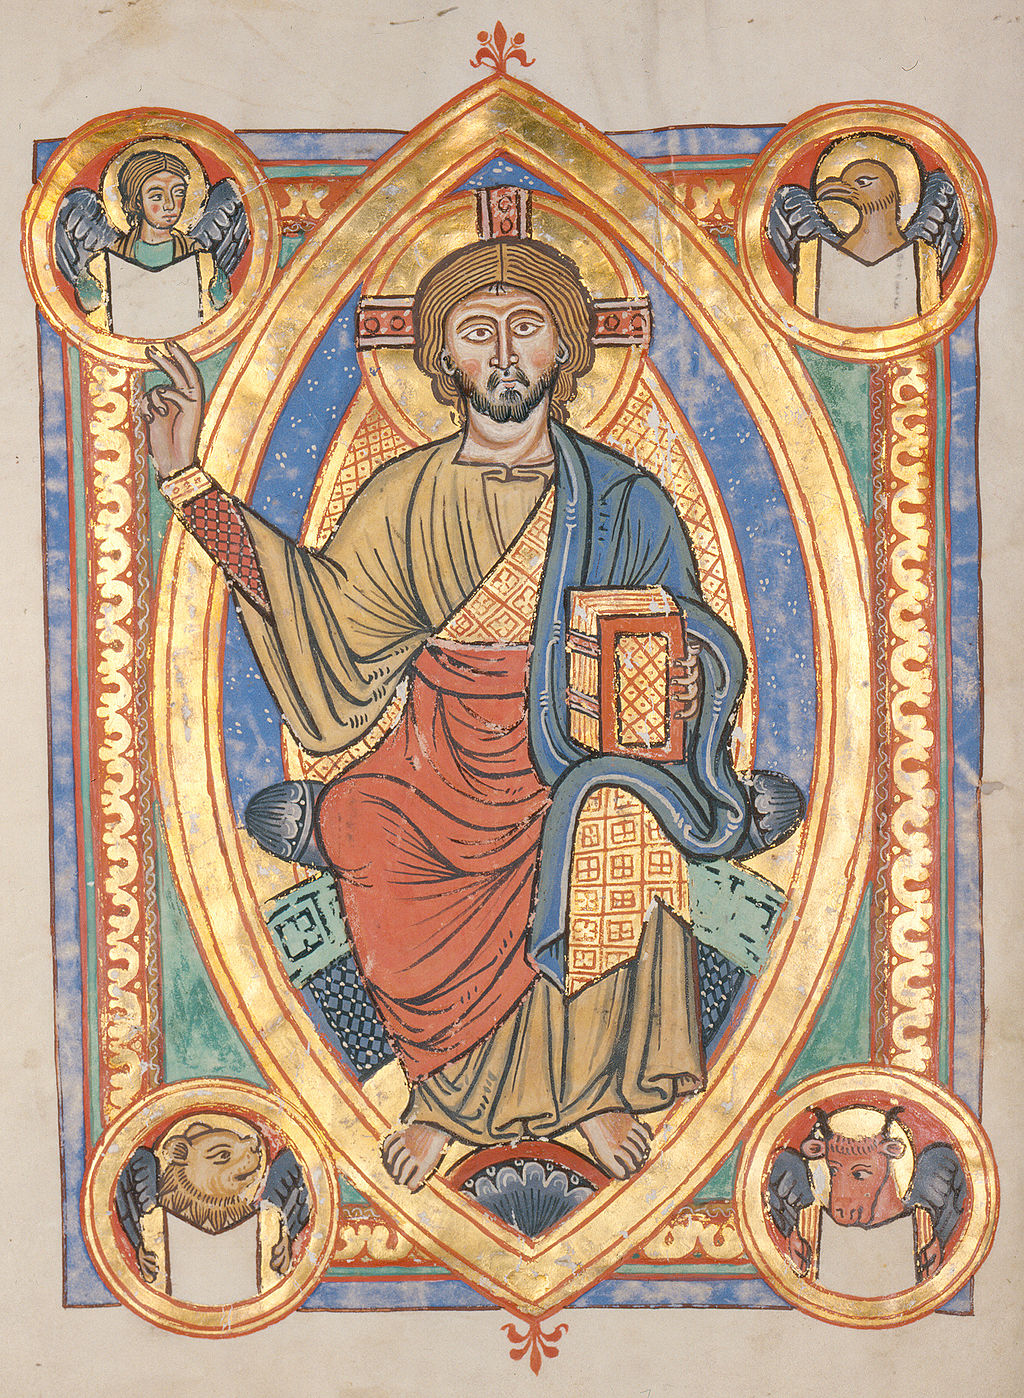 Représentation Jésus-Christ or bleu rouge manuscrit médiéval Codex Bruchsal Karlsruhe